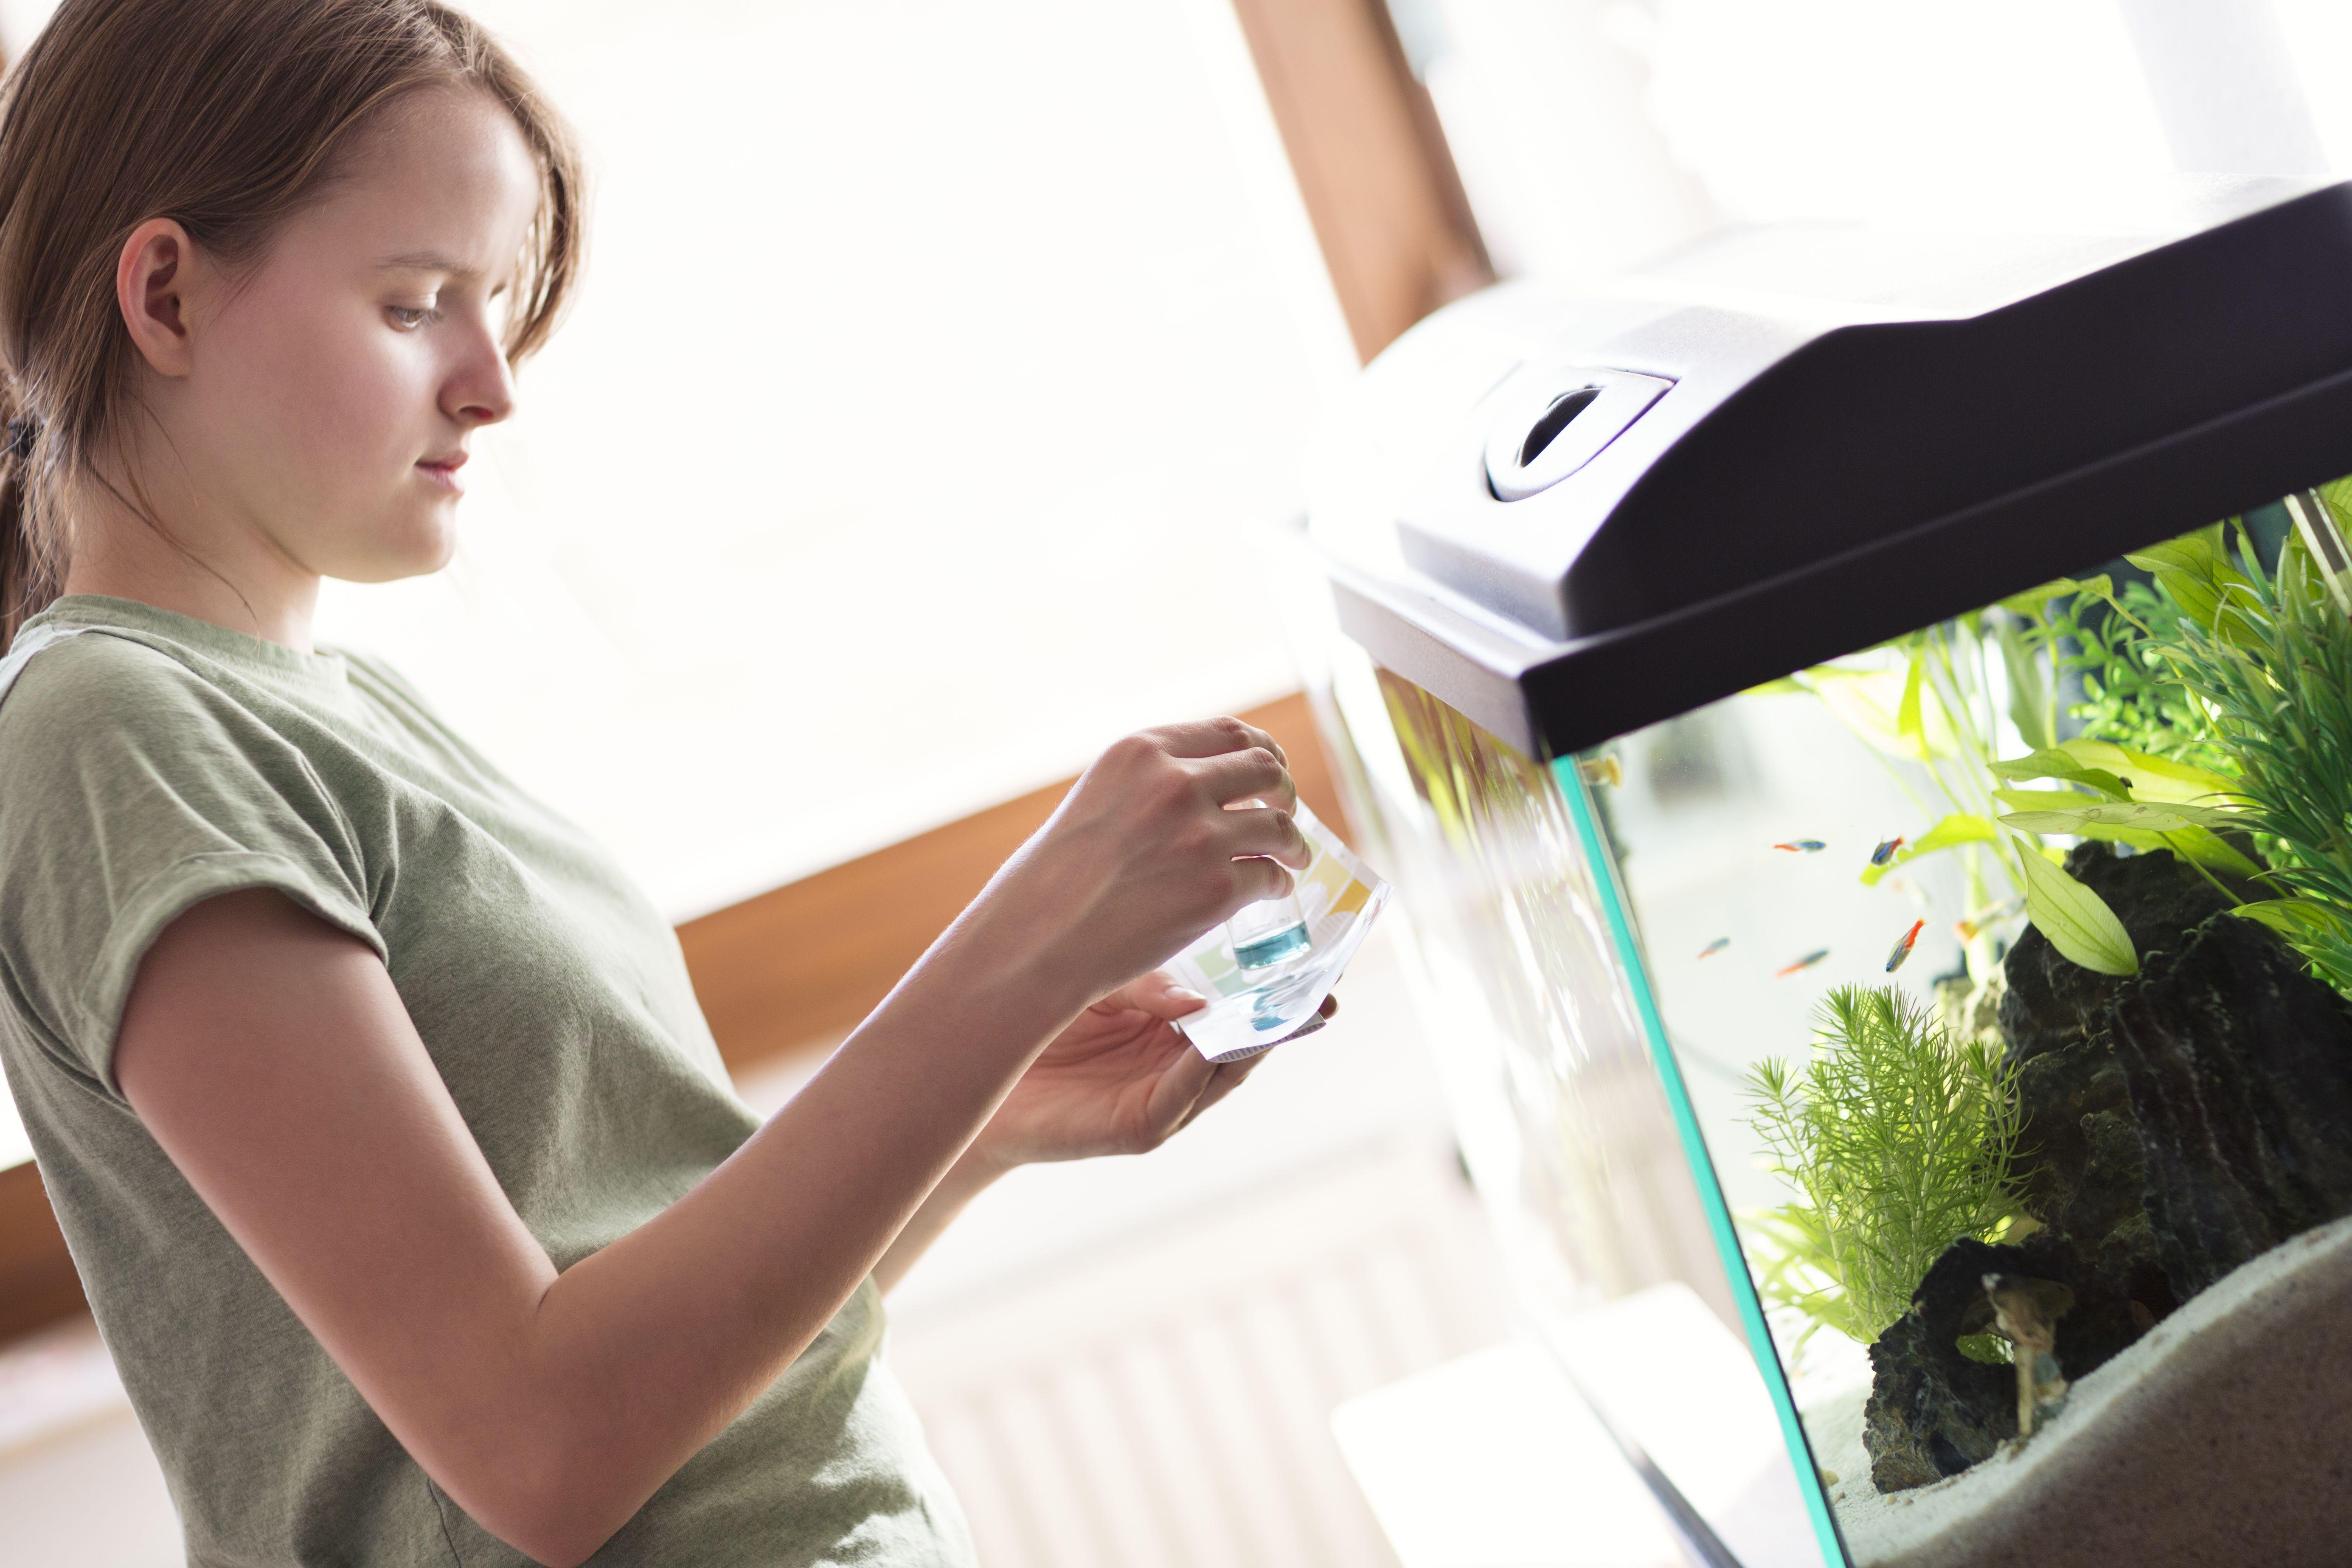 Teenage girl testing the water of a home aquarium